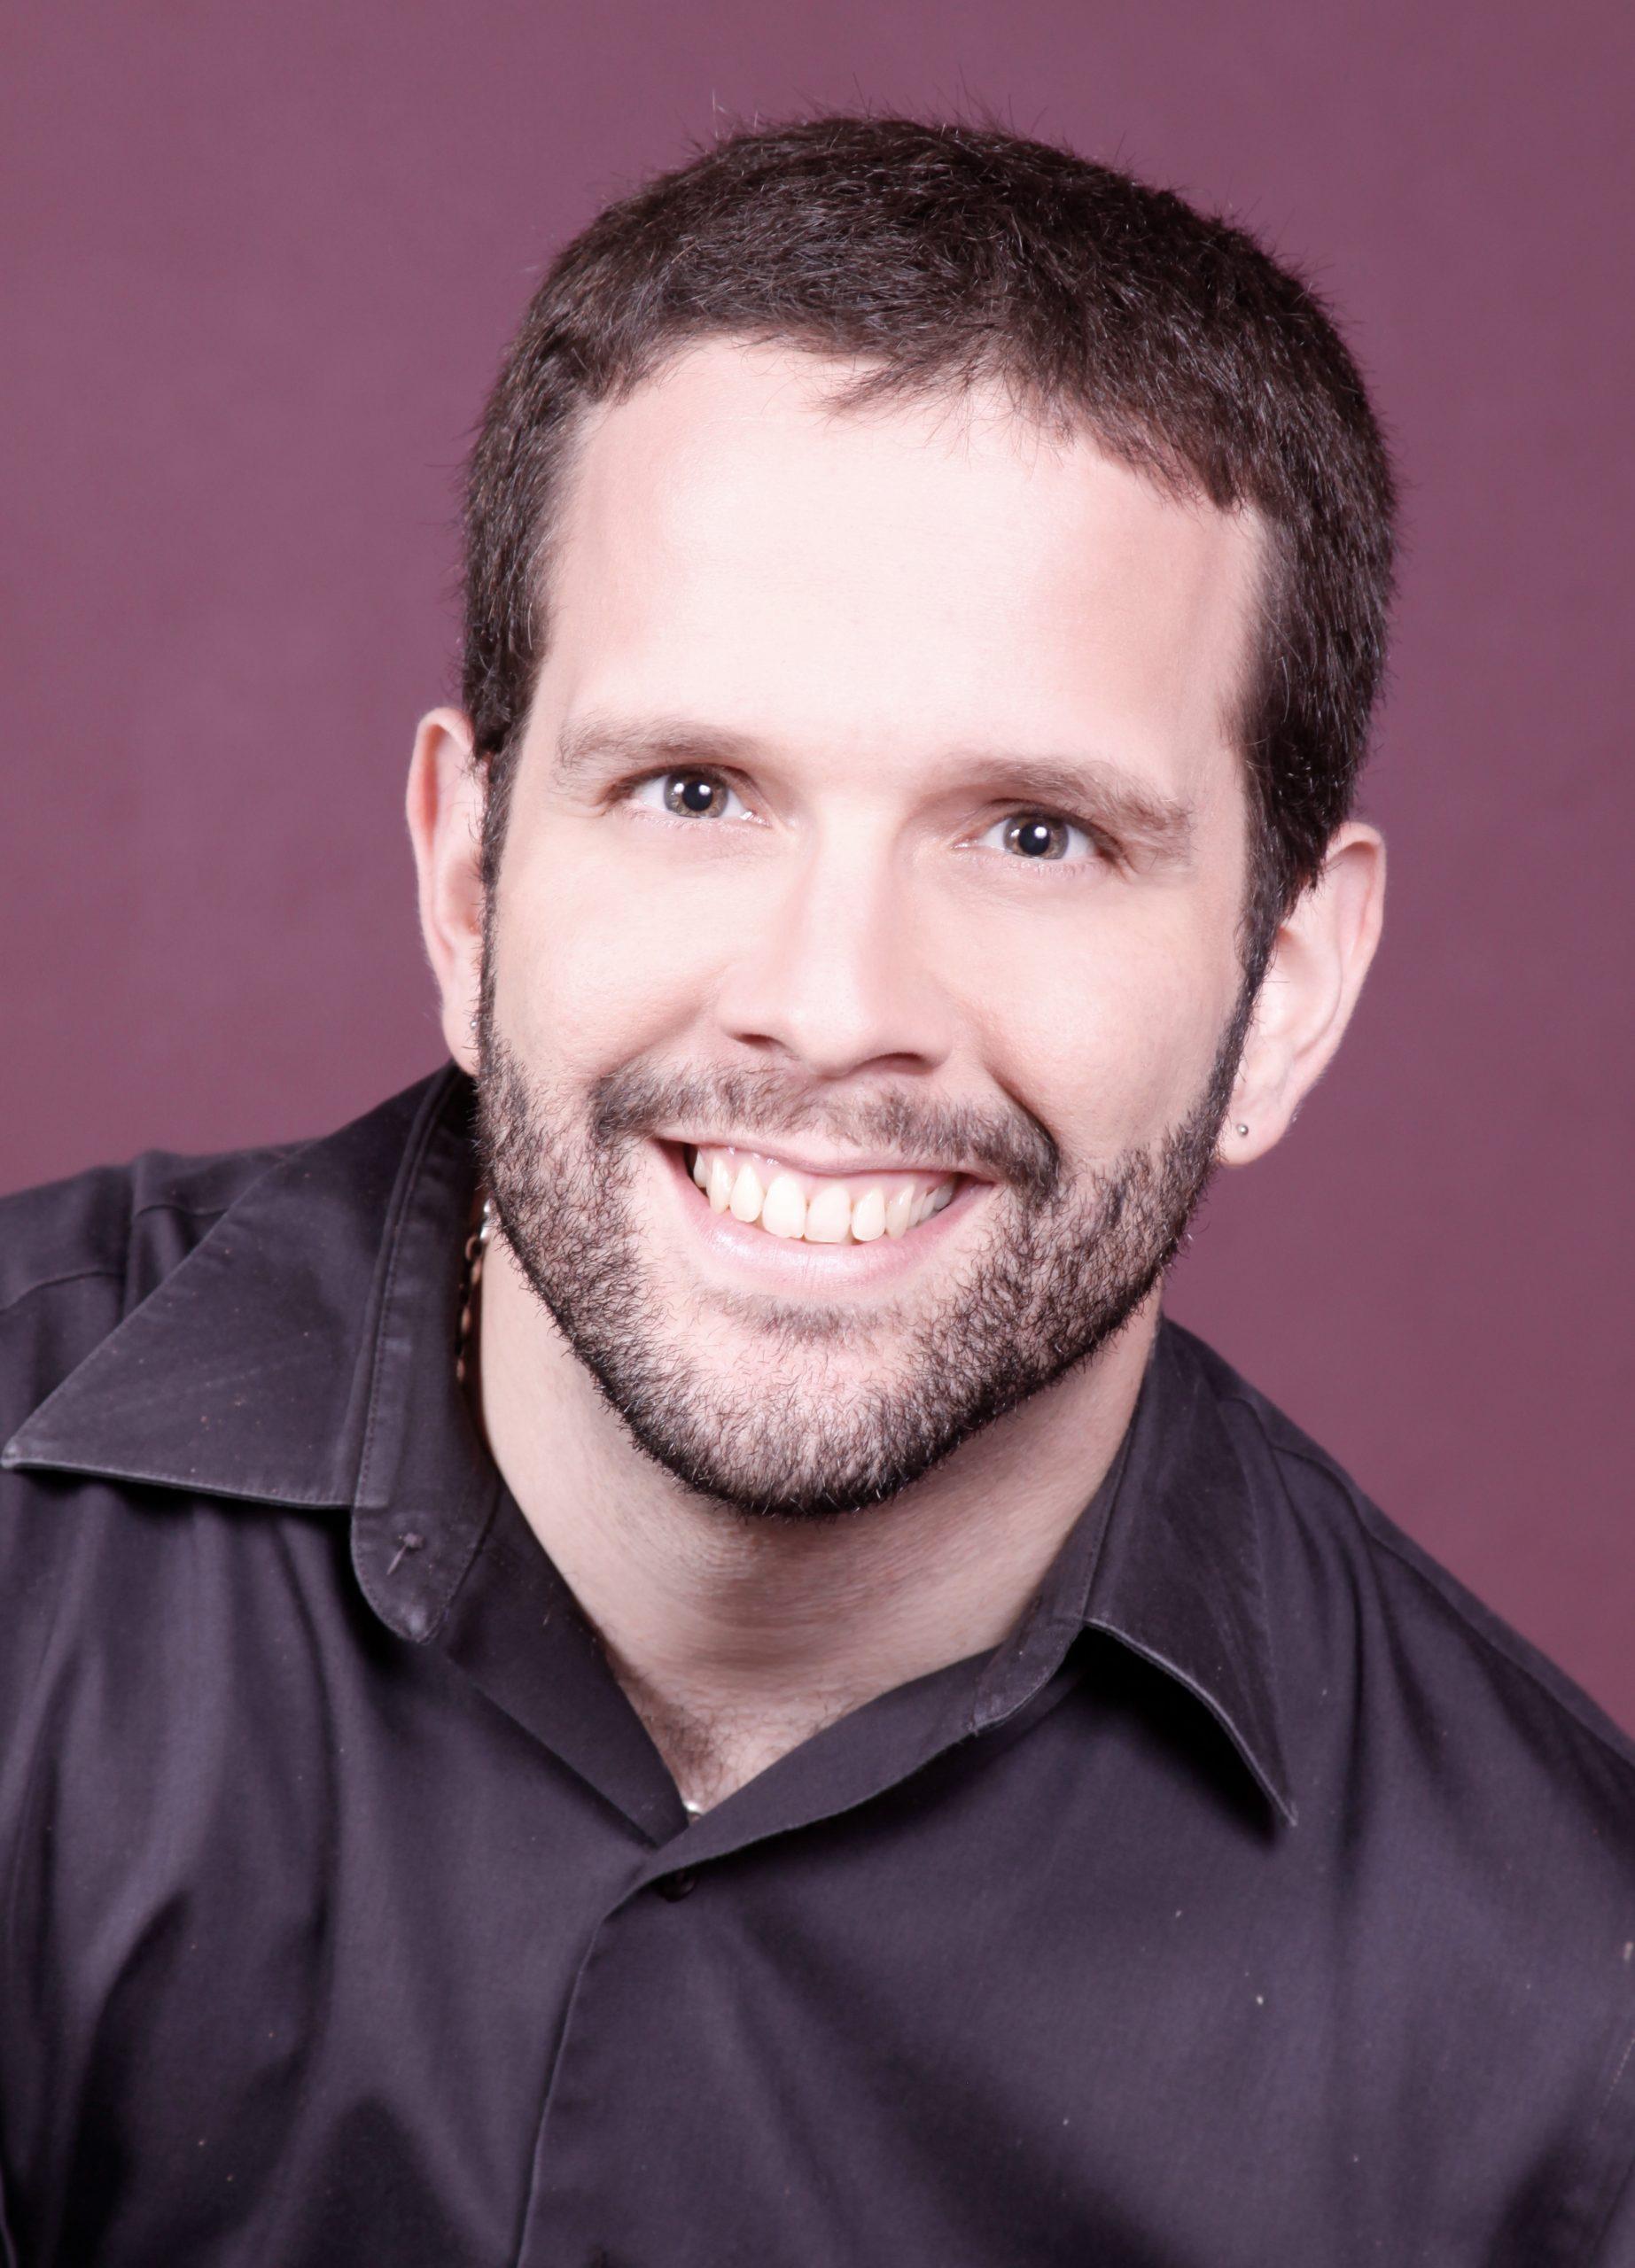 "Jorge Santiago forma parte del elenco de ""El viajecito"", de Adriana Pantoja, que se presentará en e; 3er. Festival Al Fresco este fin de semana. (Foto suministrada)"